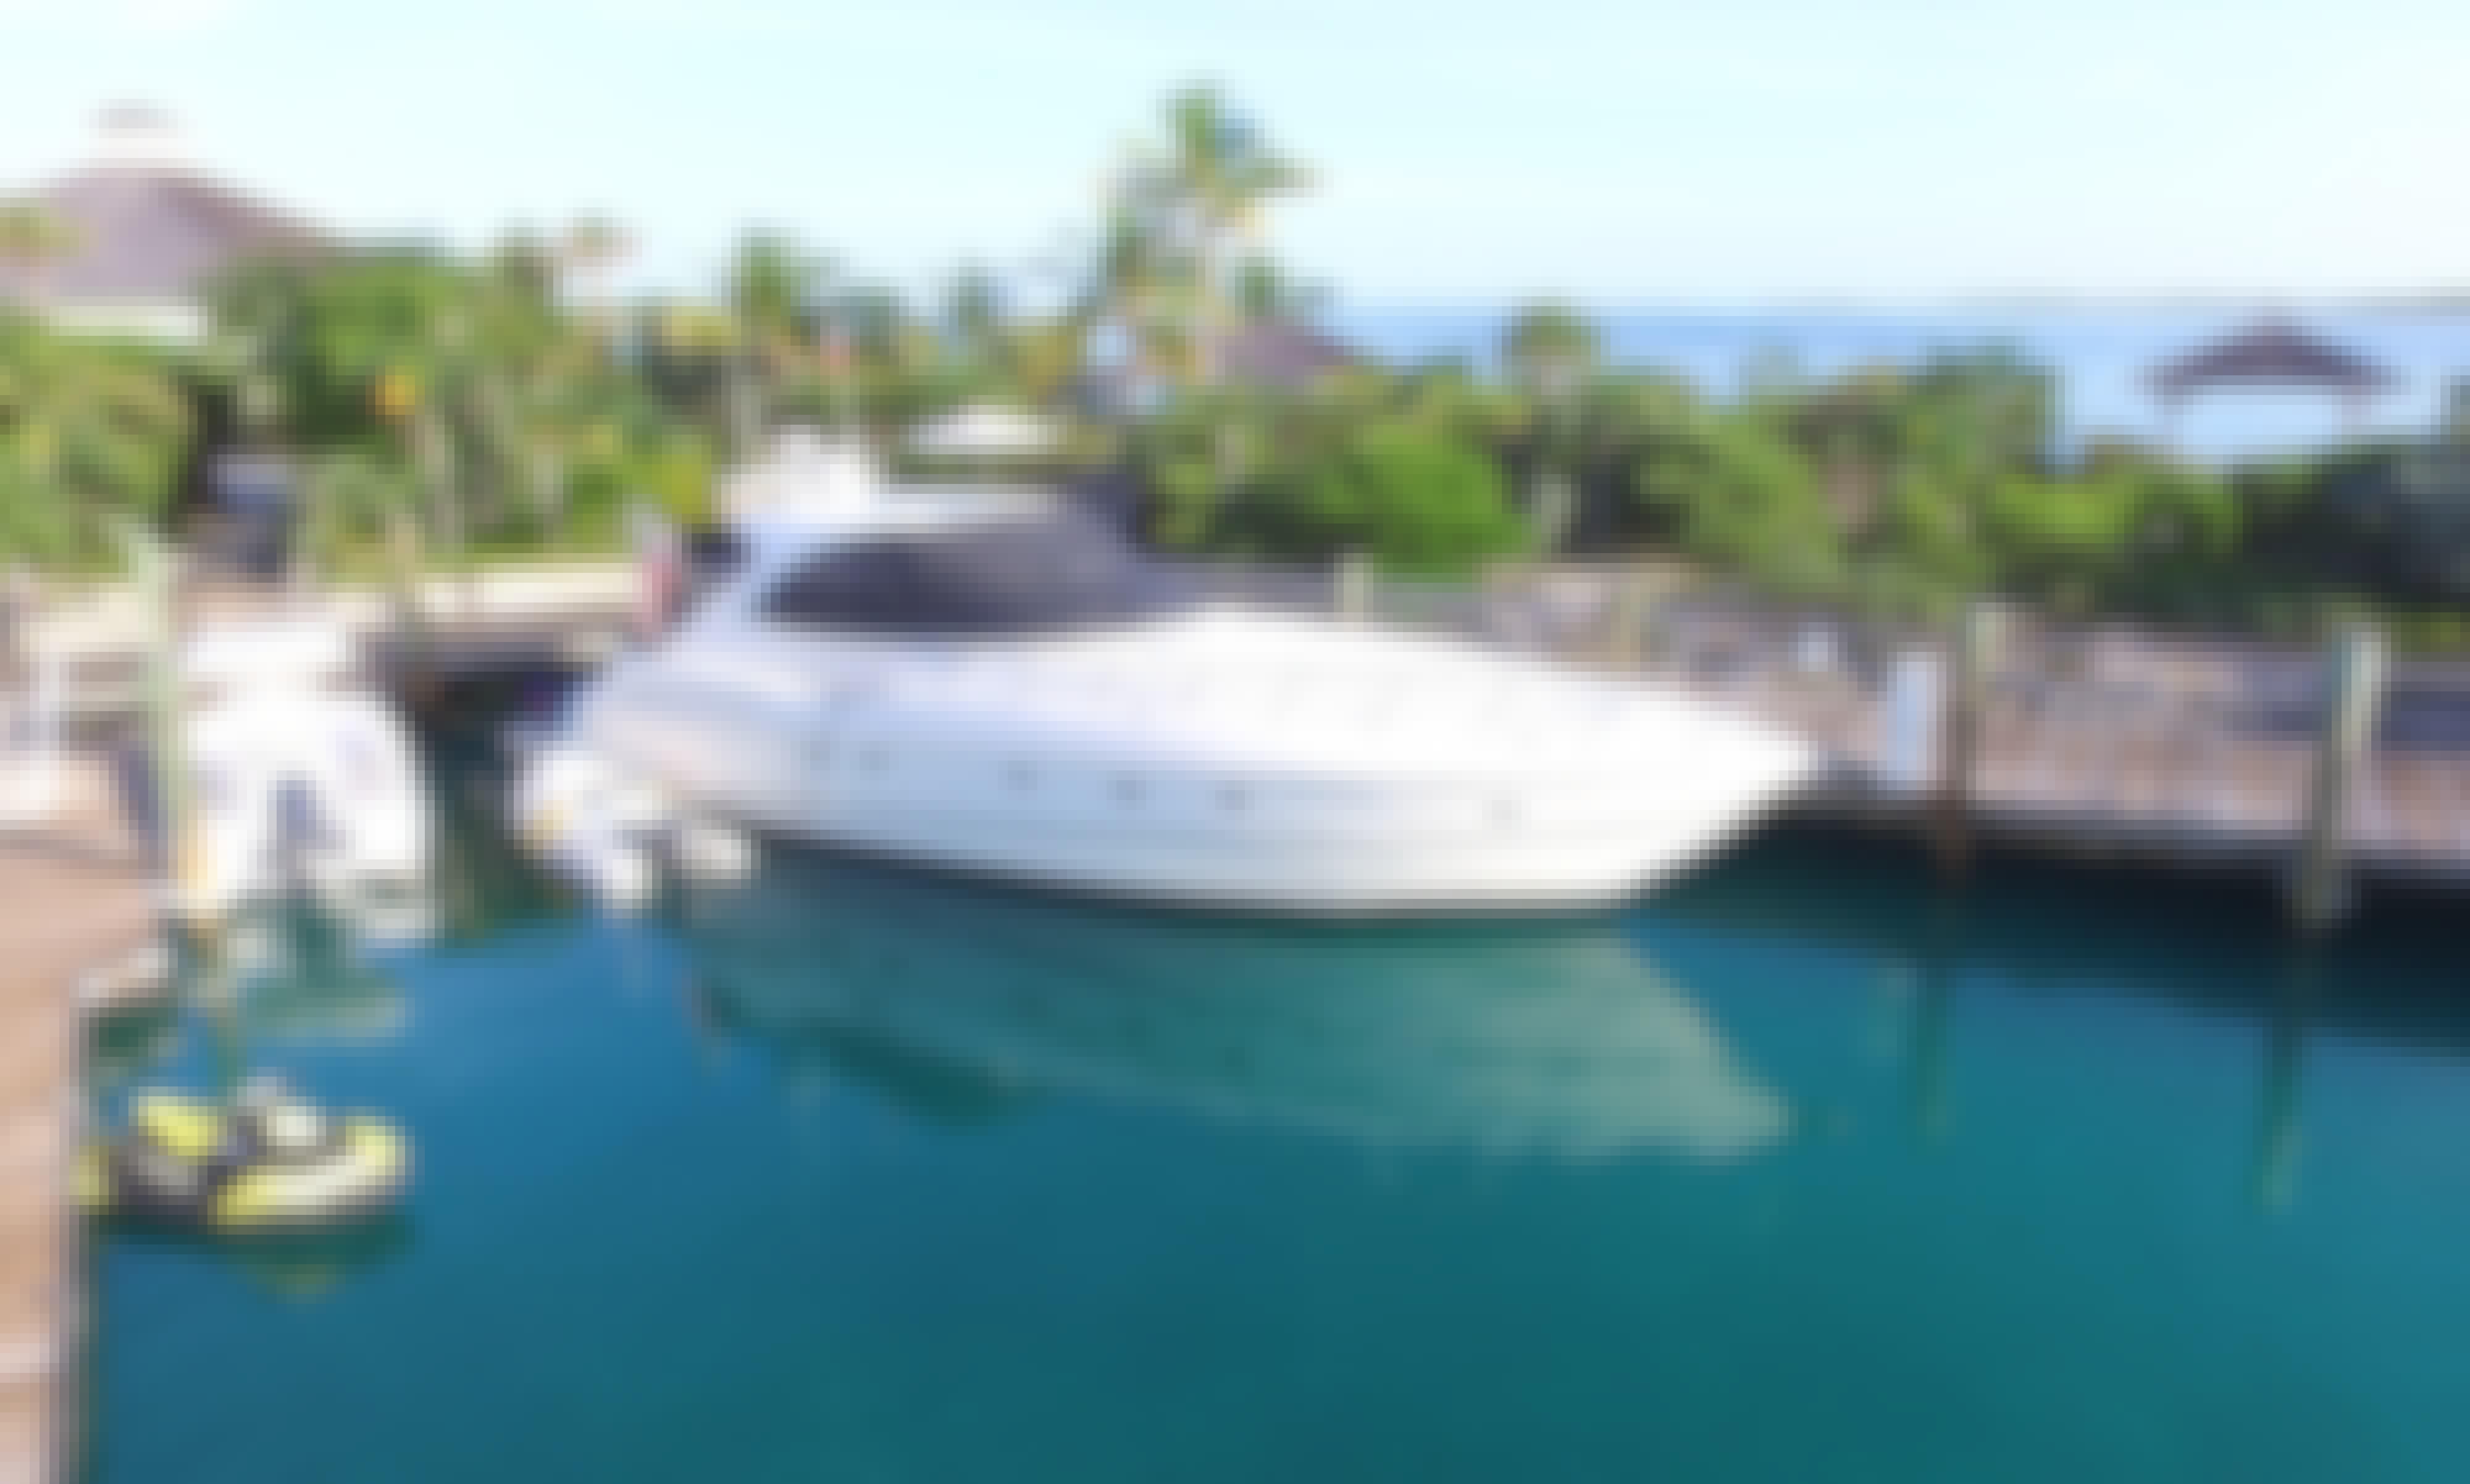 58' Cruiser Yacht- Sunny Isles, Fort Lauderdale, Miami